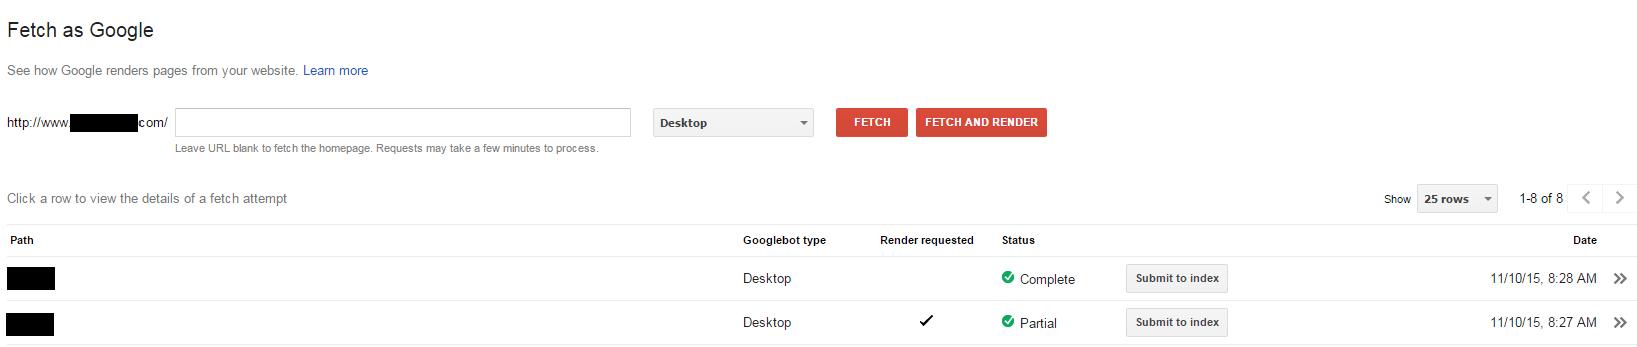 Google Fetch and Render - Browser Media